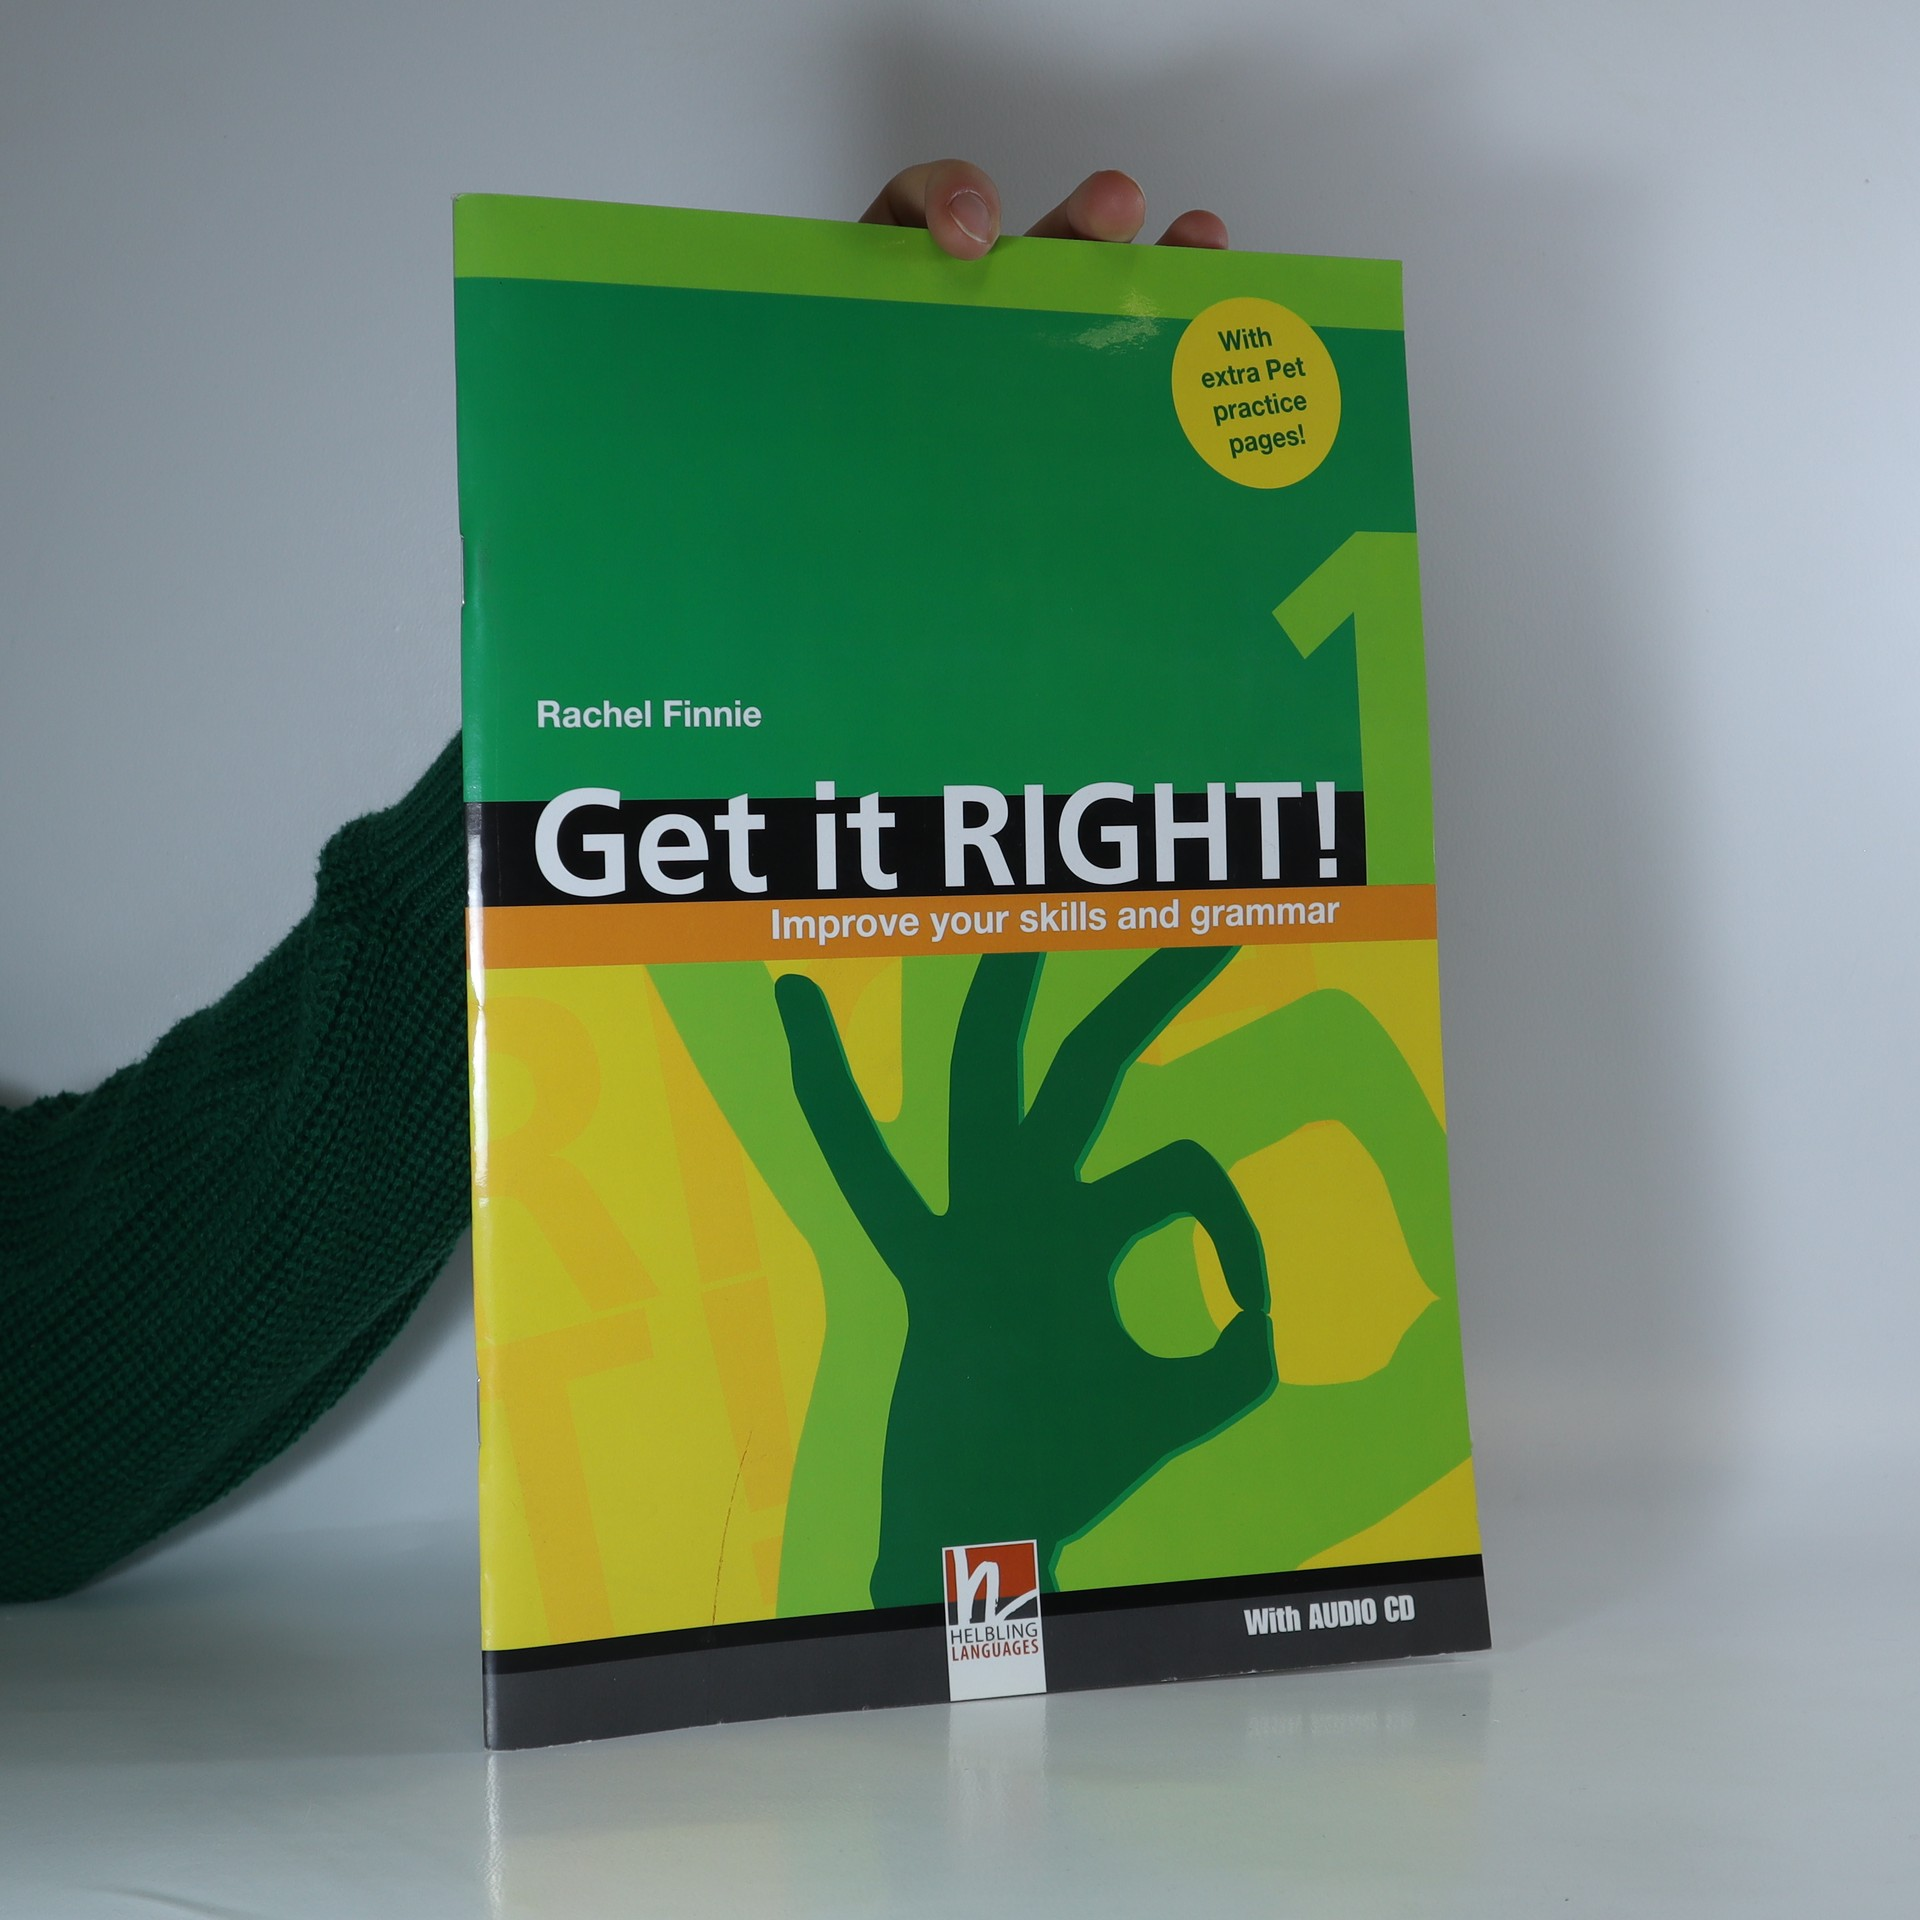 antikvární kniha Get it right! 1. Improve your skills and grammar, 2006